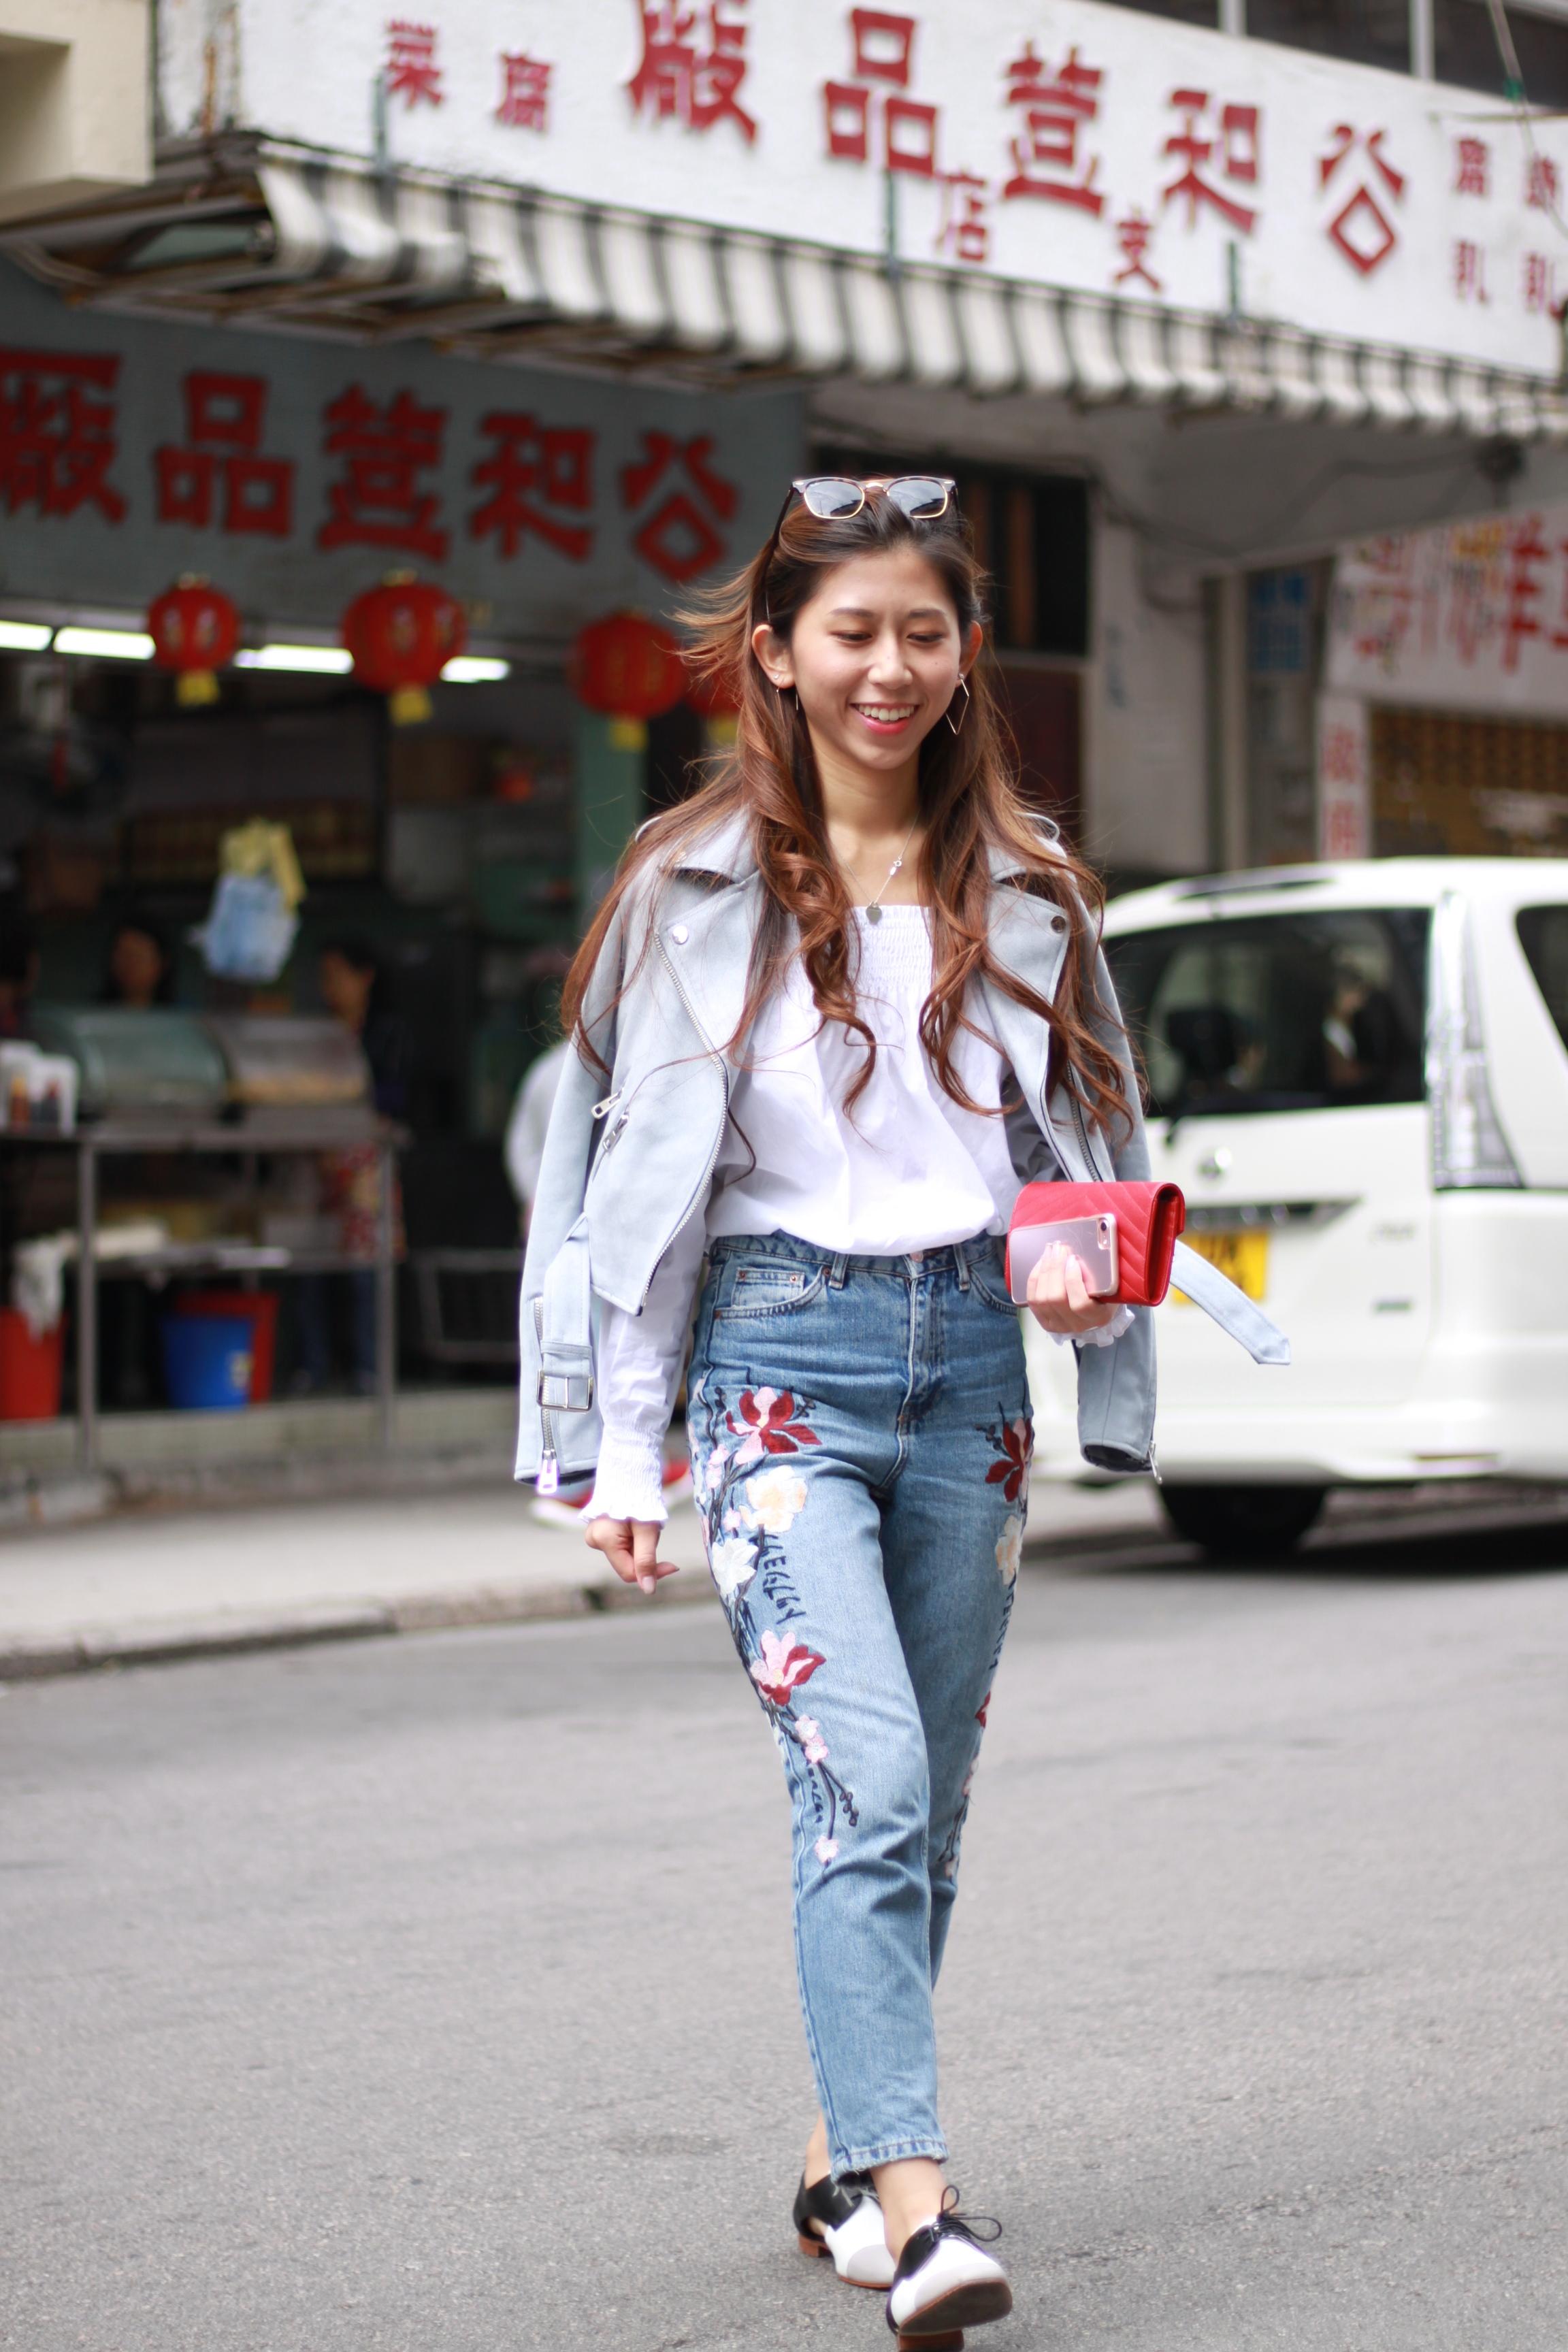 Zara off shoulder top /  Topshop MOTO floral embroidered mom jeans /  Zara suede biker jacket / Giordano Ladies cut-out oxford shoes /  YSL monogram flap wallet / DearPostman triangle hoop earrings